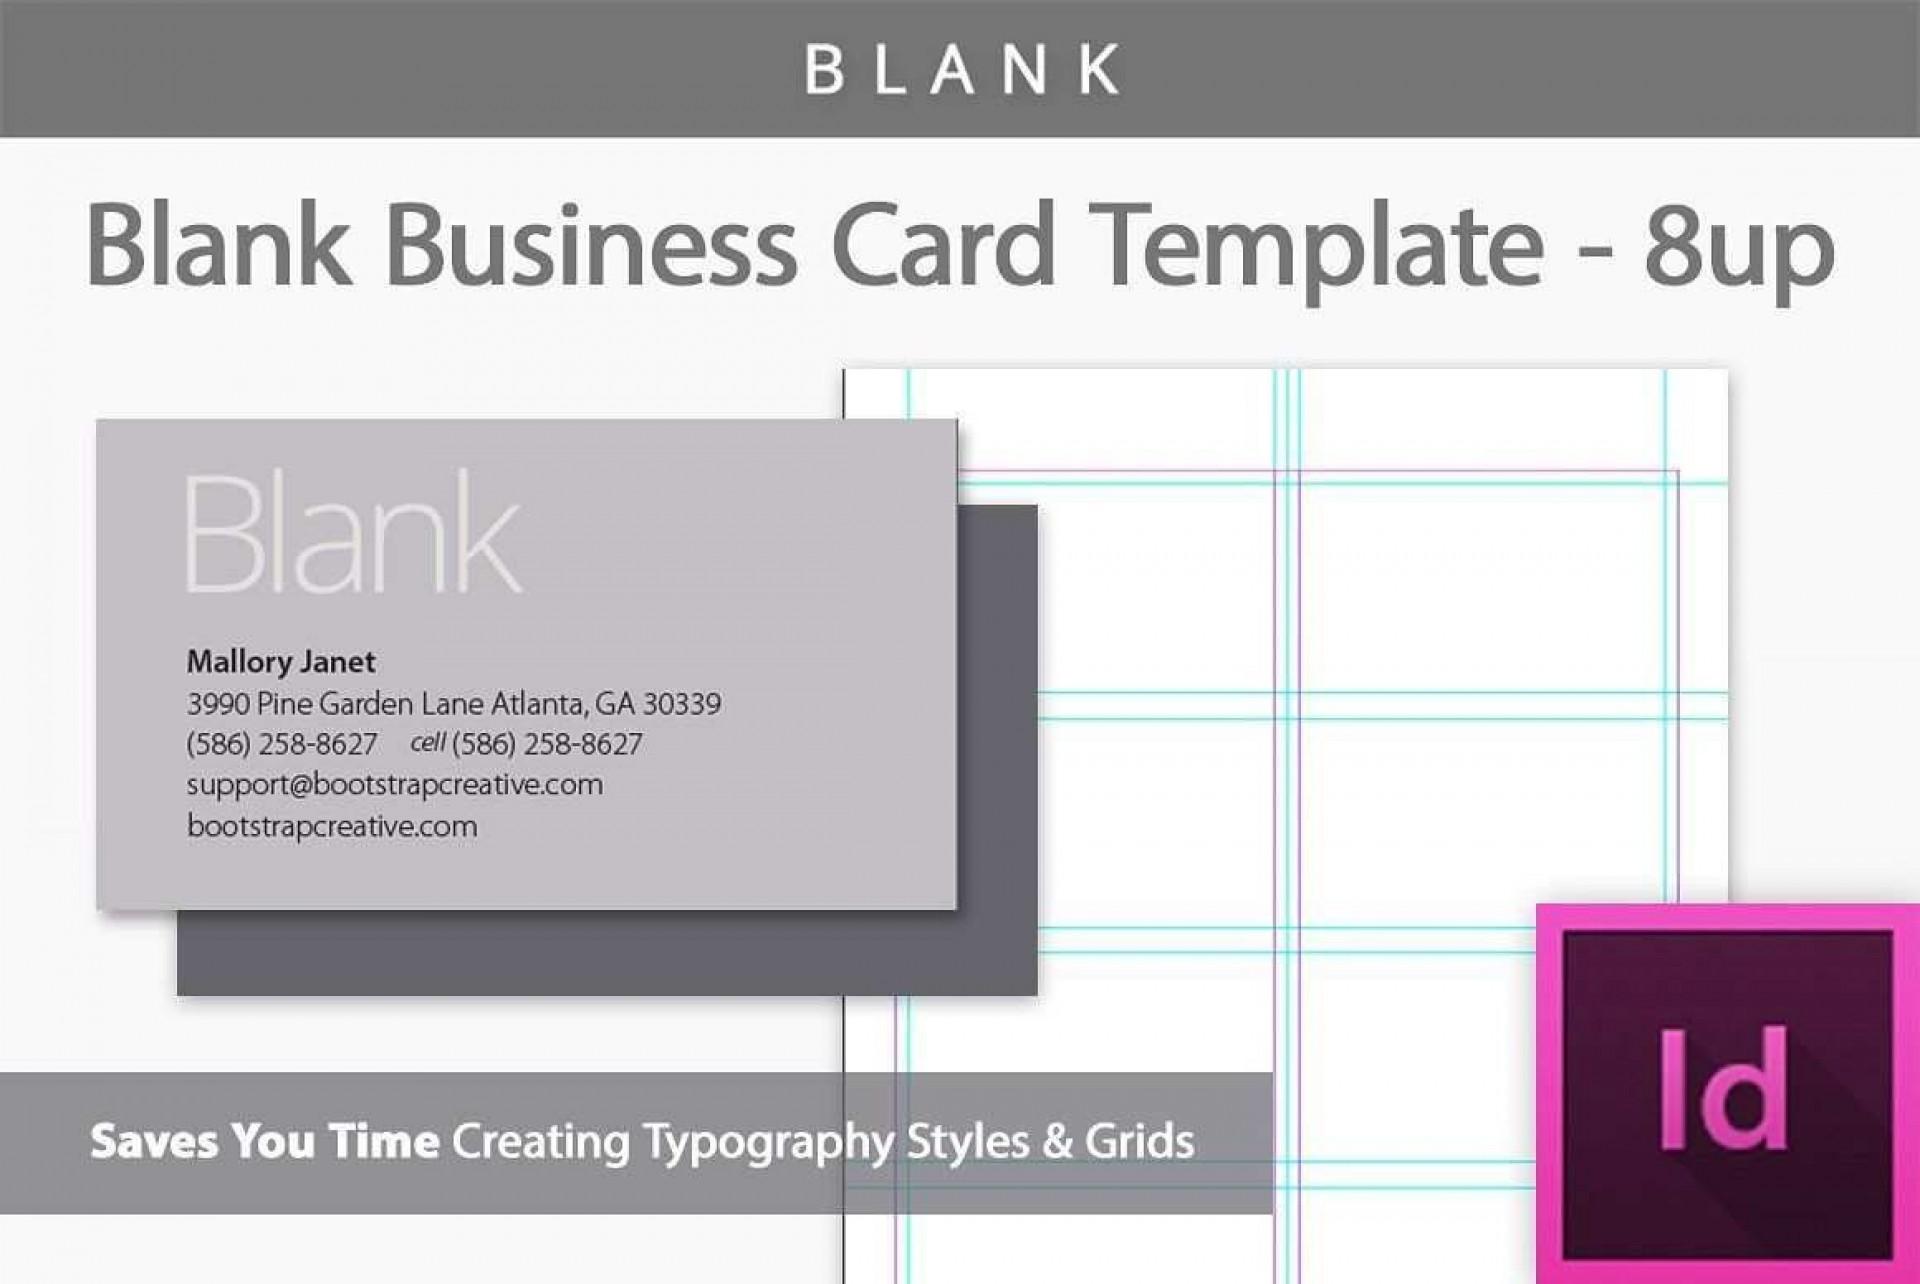 005 Best Blank Busines Card Template Word Photo  Vertical Microsoft 2013 Avery1920